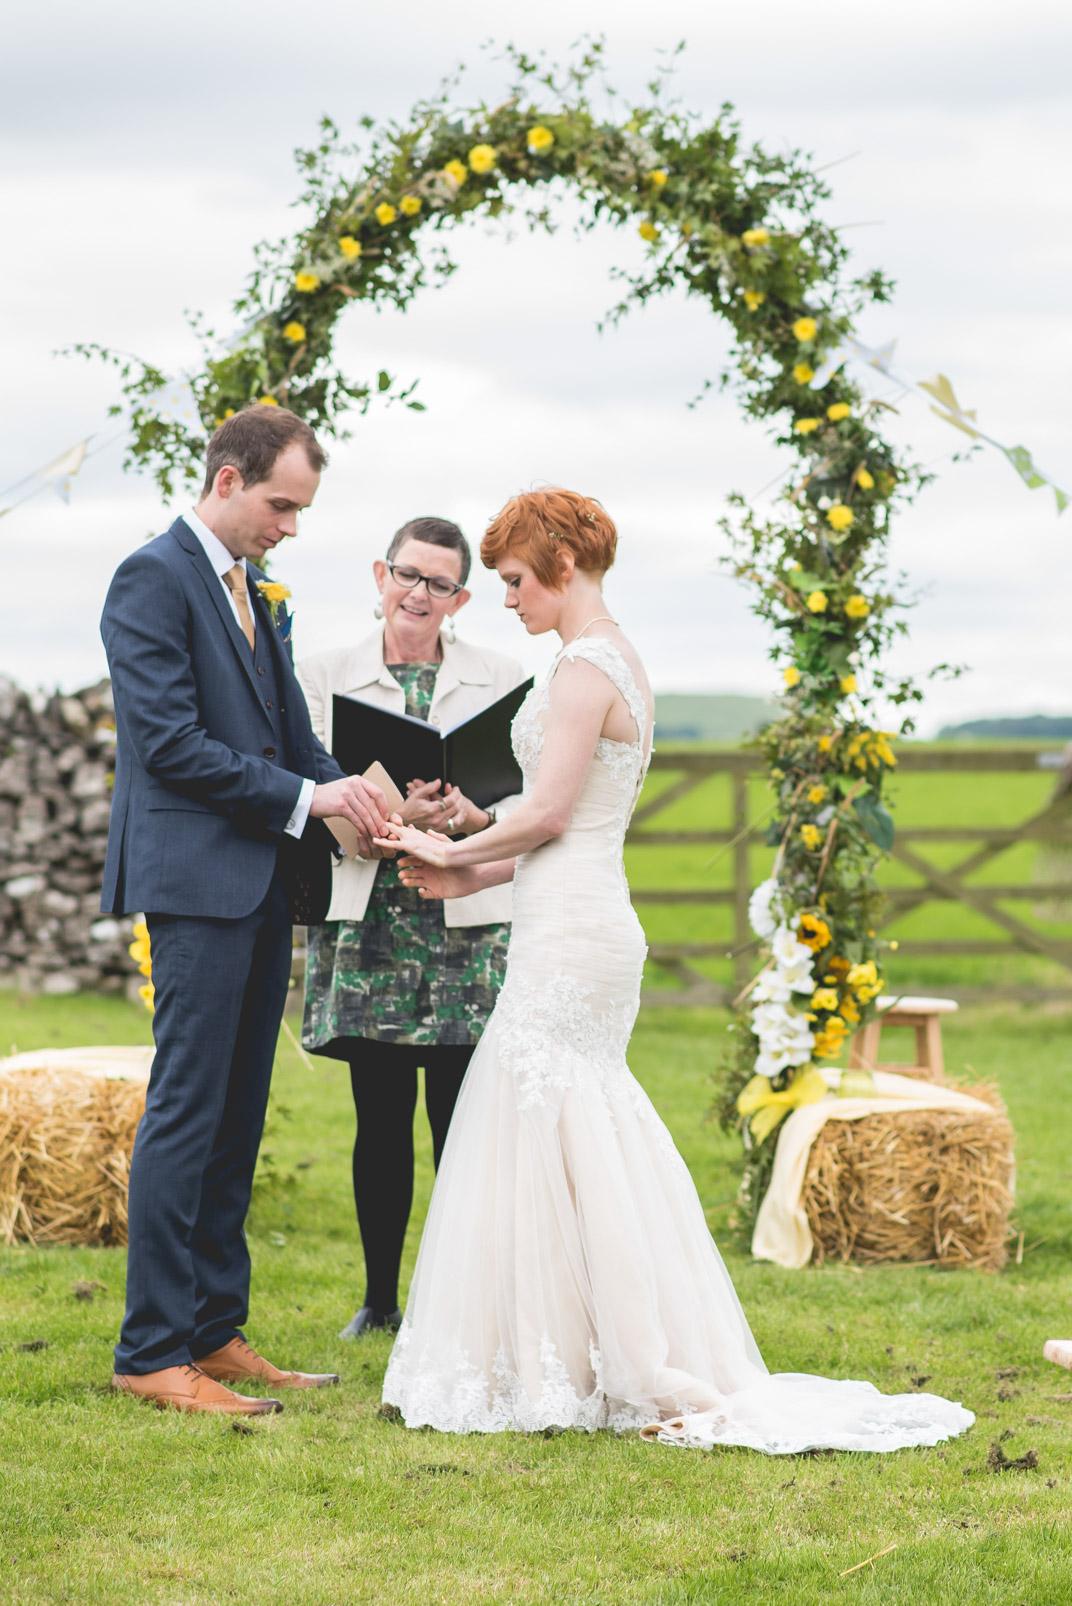 Peak+district+farm+wedding+lower+damgate+photographer-136.jpg